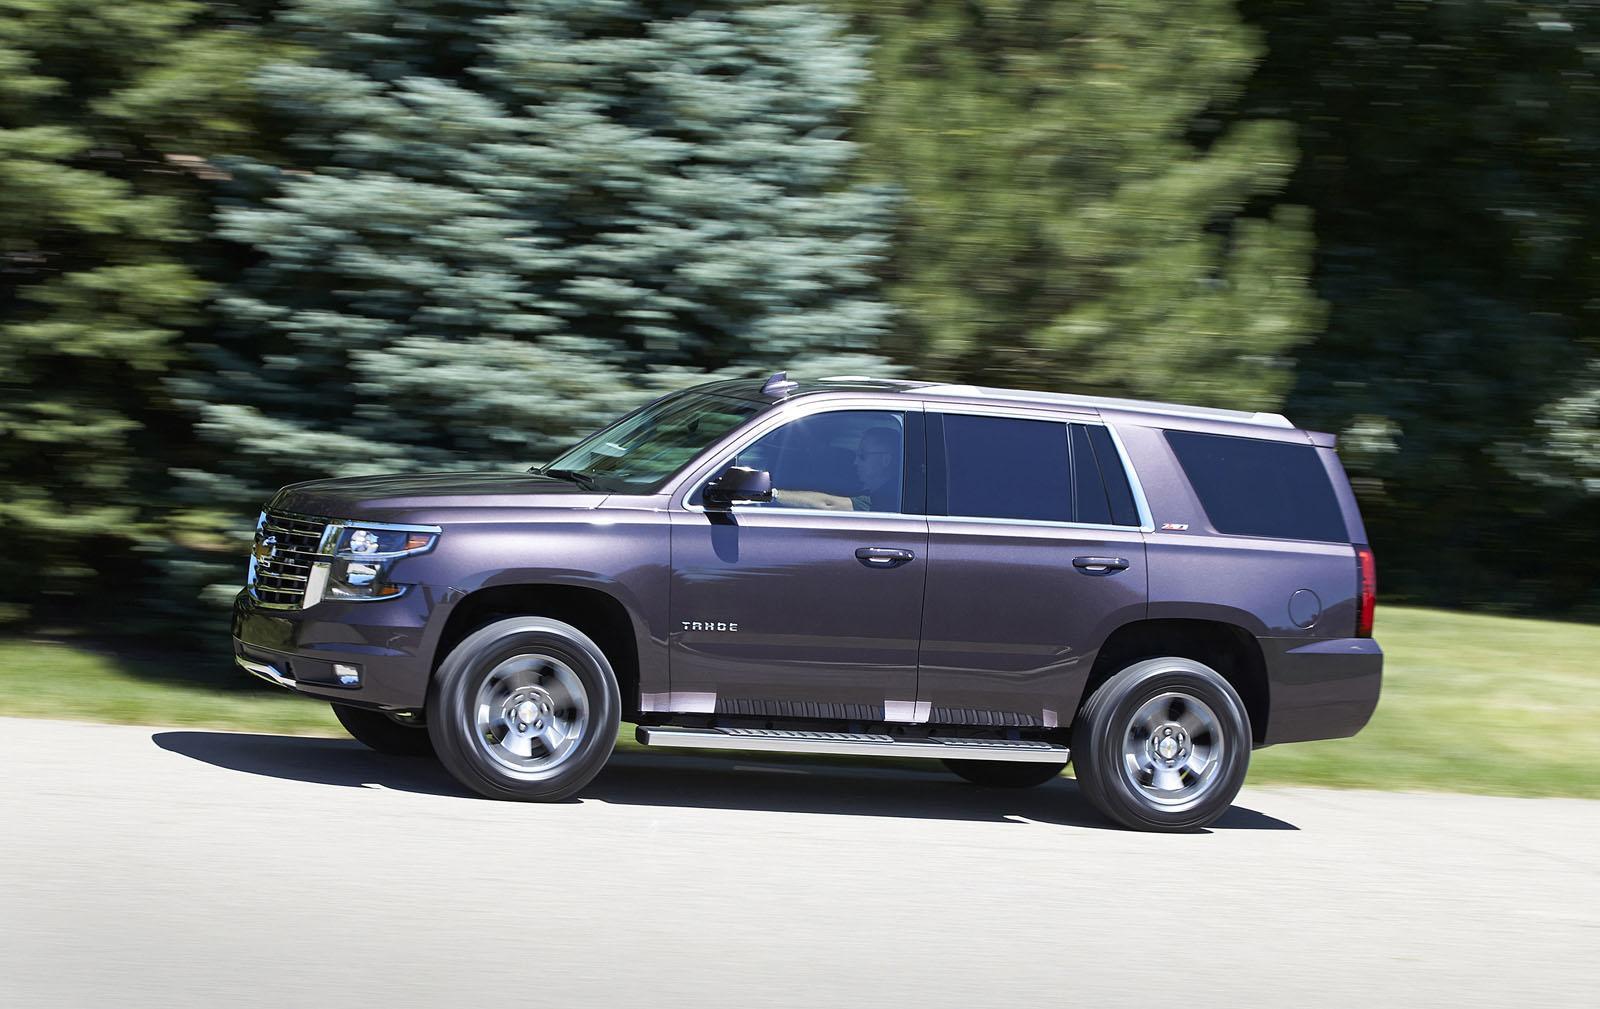 Buick Dealership Corpus Christi >> 2015 Chevrolet Reaper Truck For Sale | Autos Post